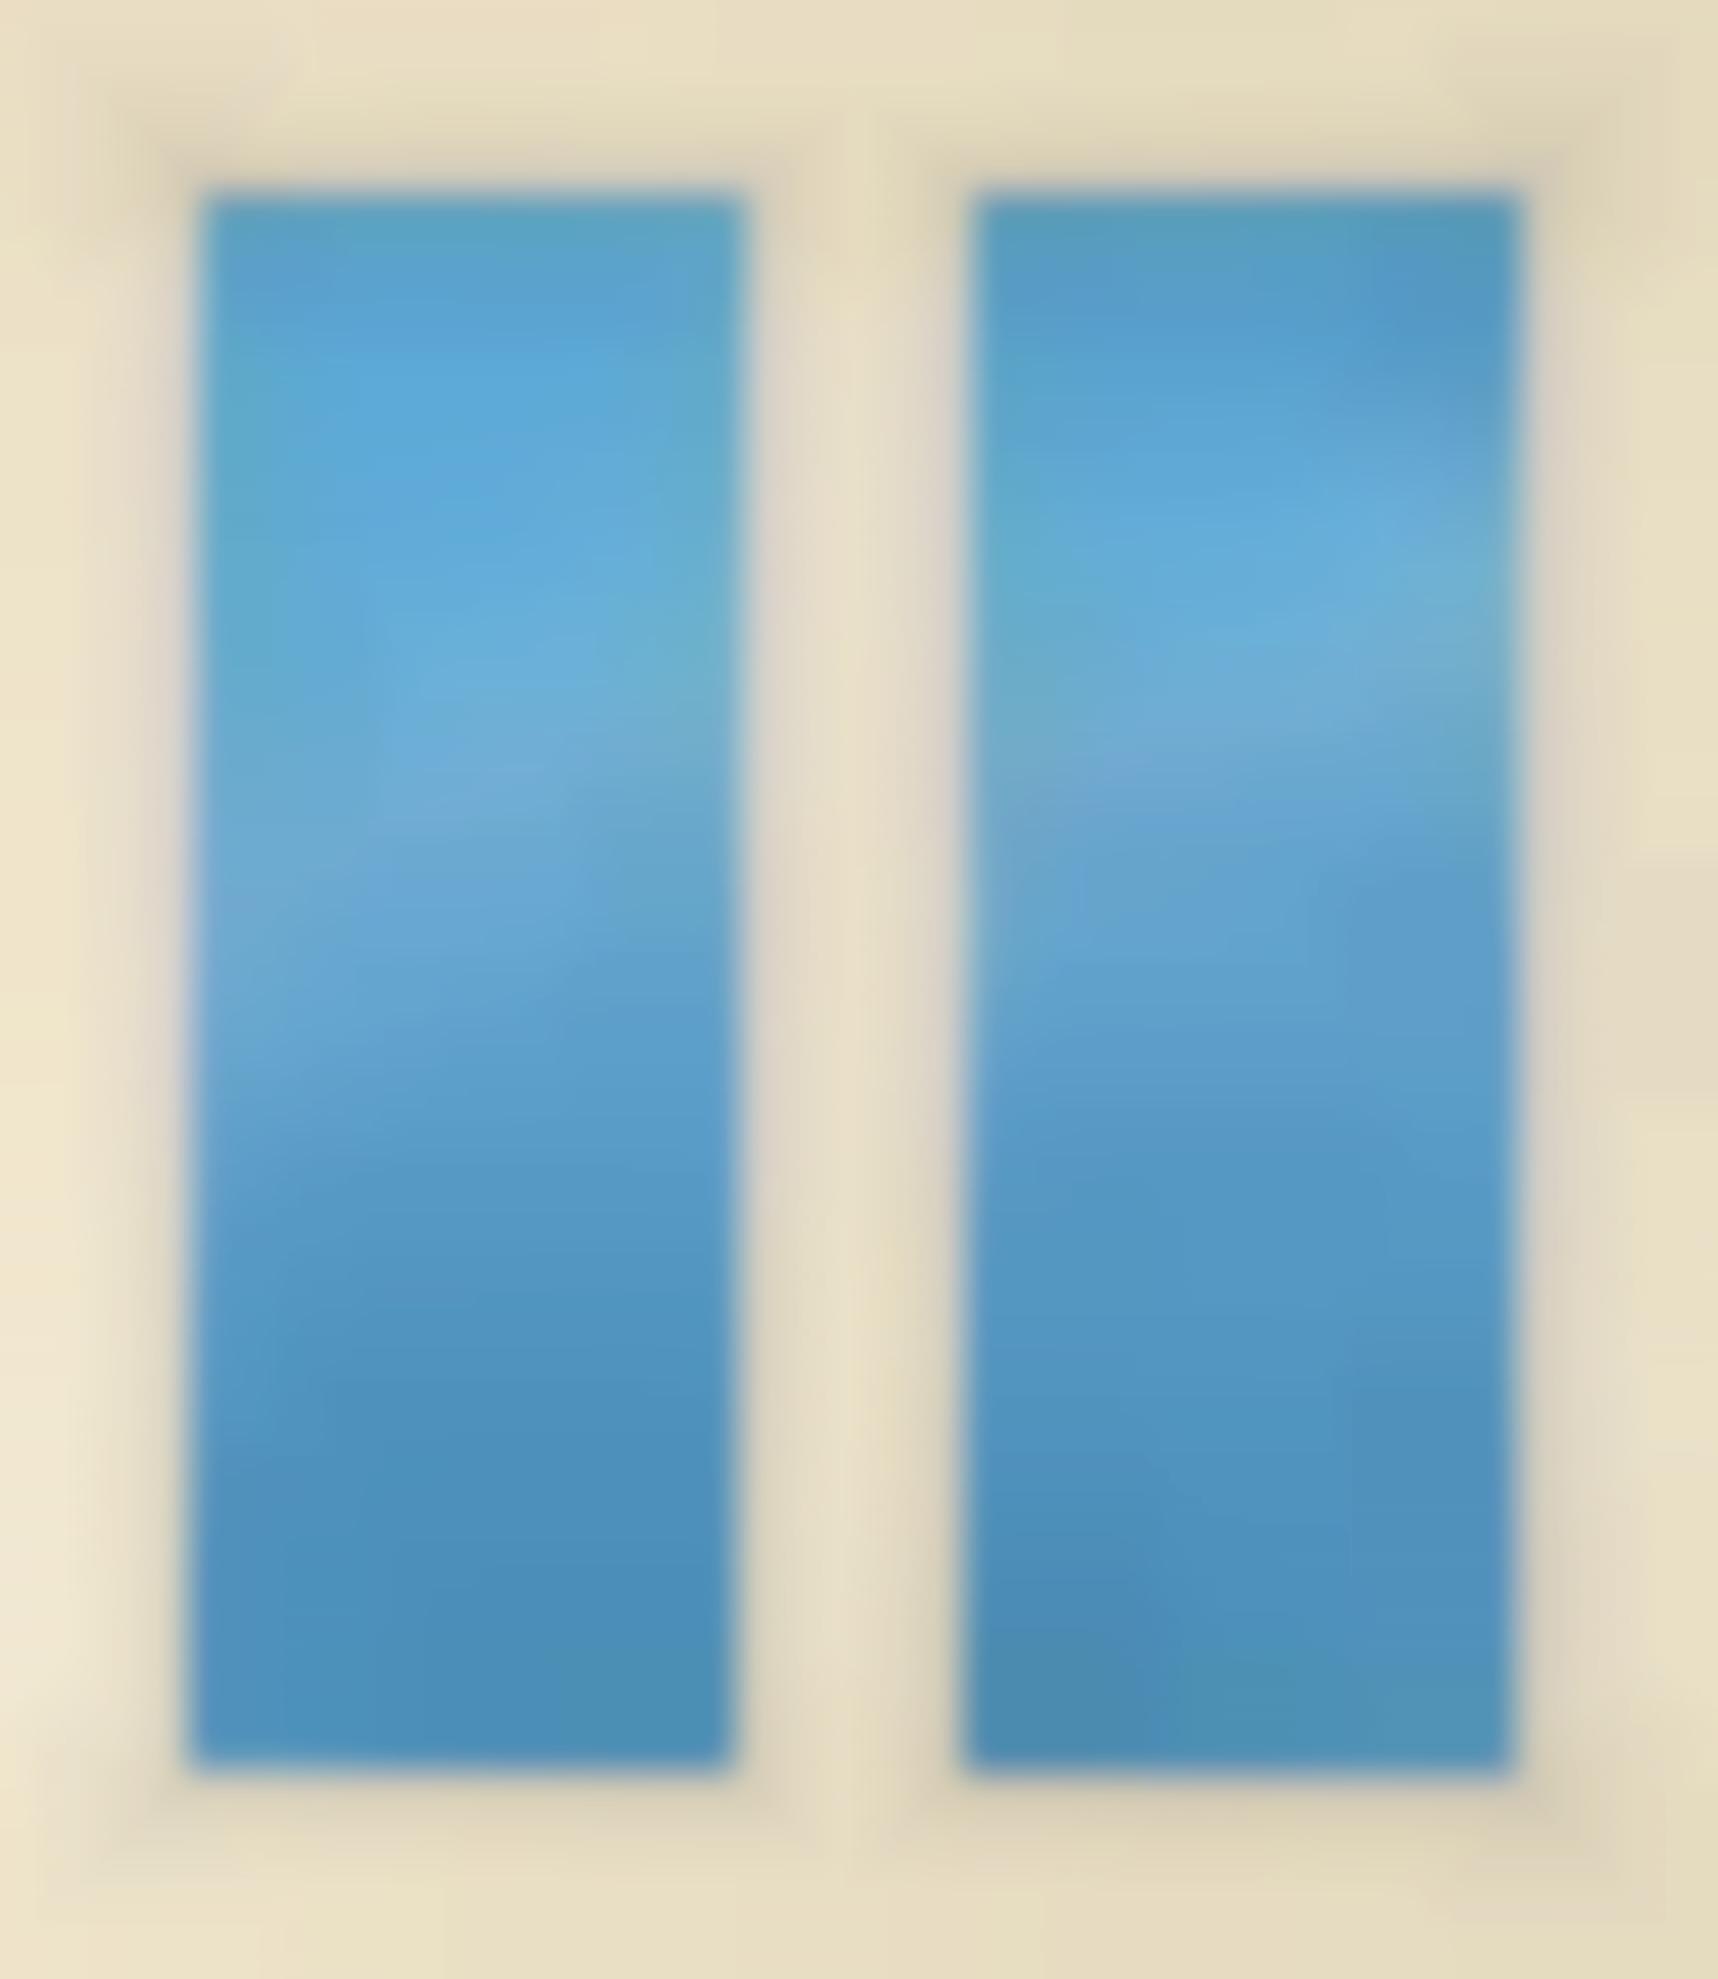 Ugo Rondinone-Clockwork For Oracles (Dark Blue)-2002